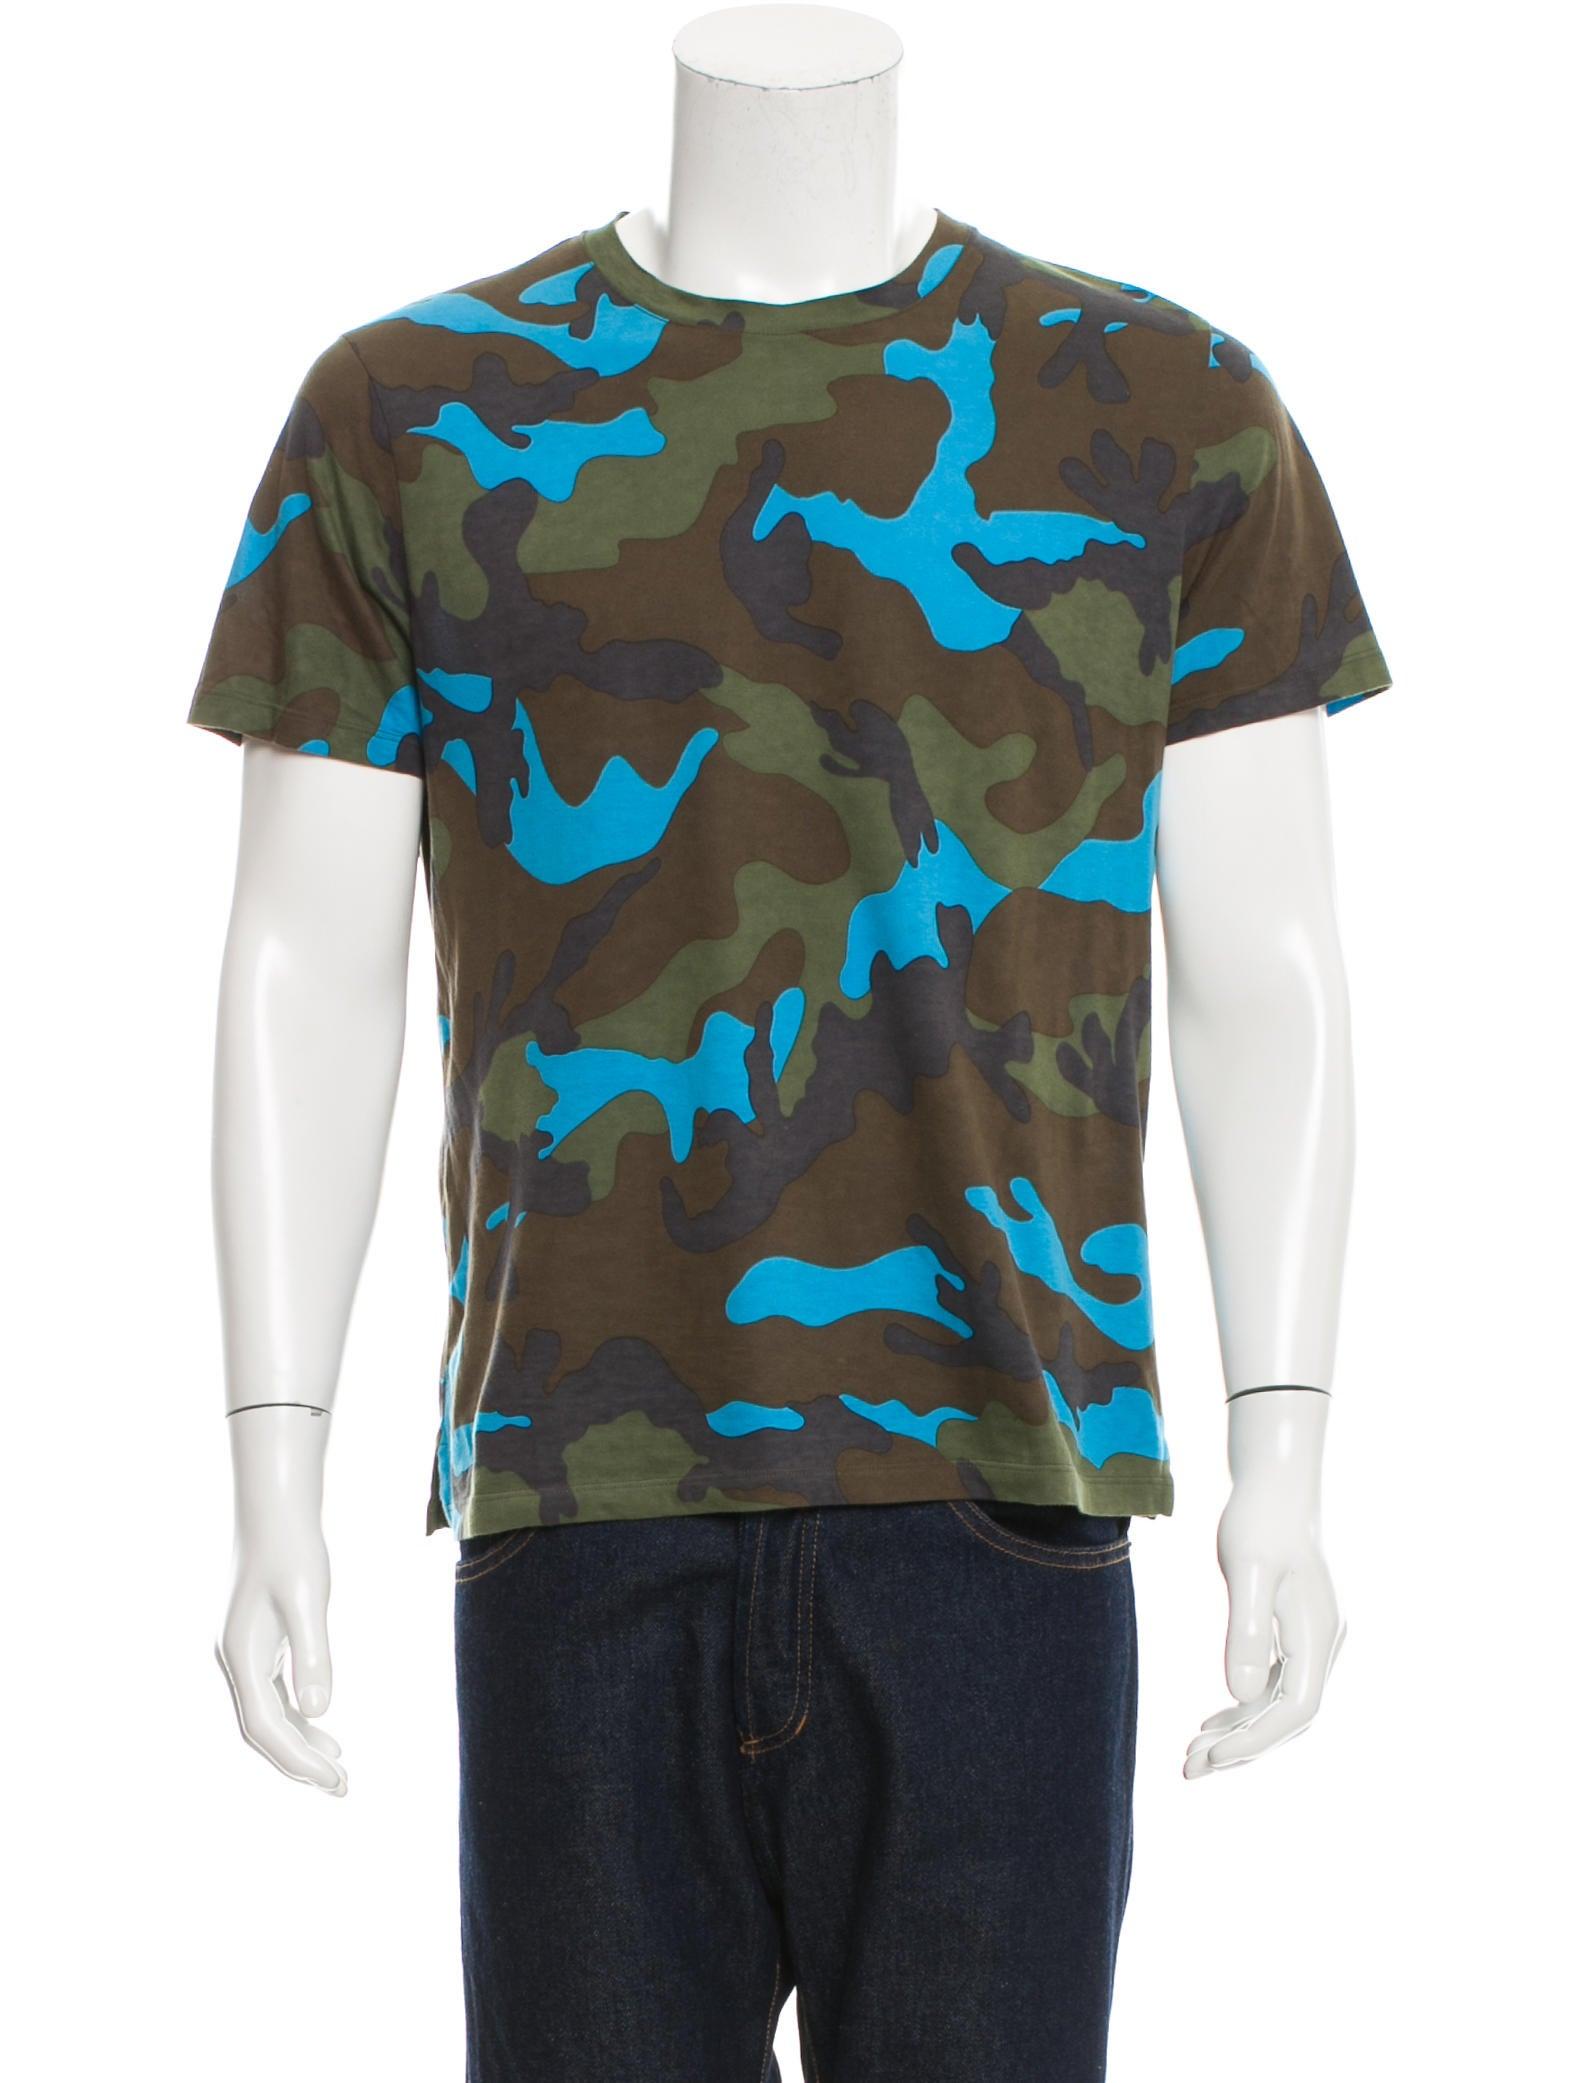 Valentino Camouflage Rockstud T Shirt Clothing